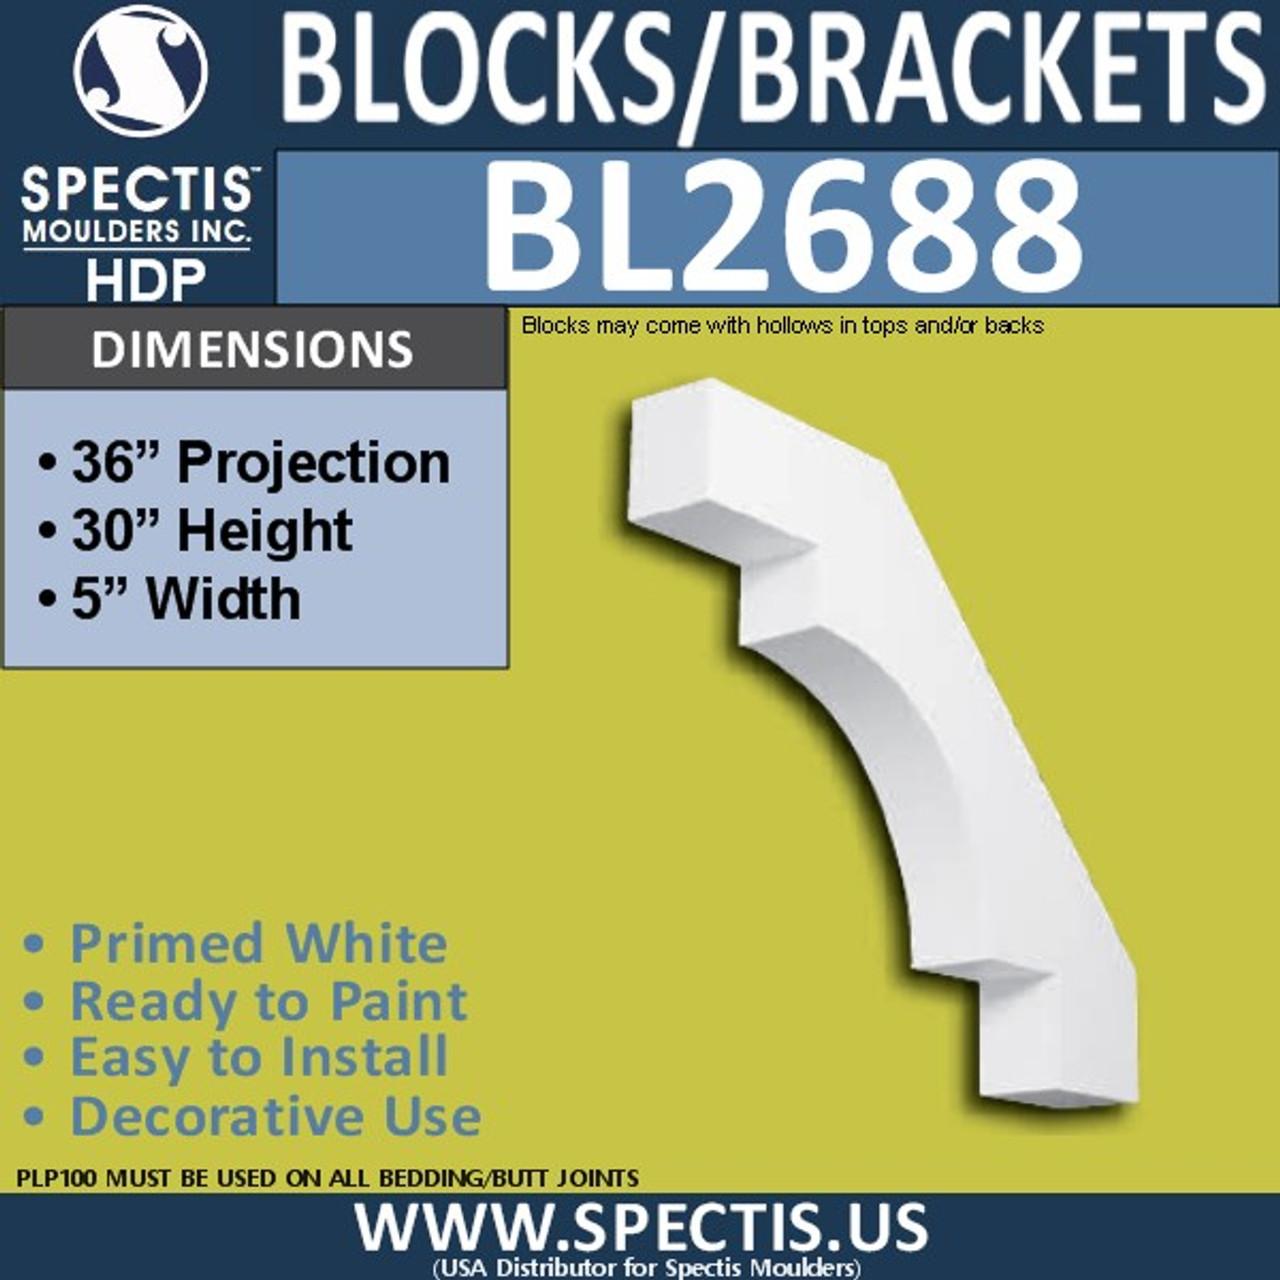 "BL2688 Eave Block or Bracket 5""W x 30""H x 36"" P"